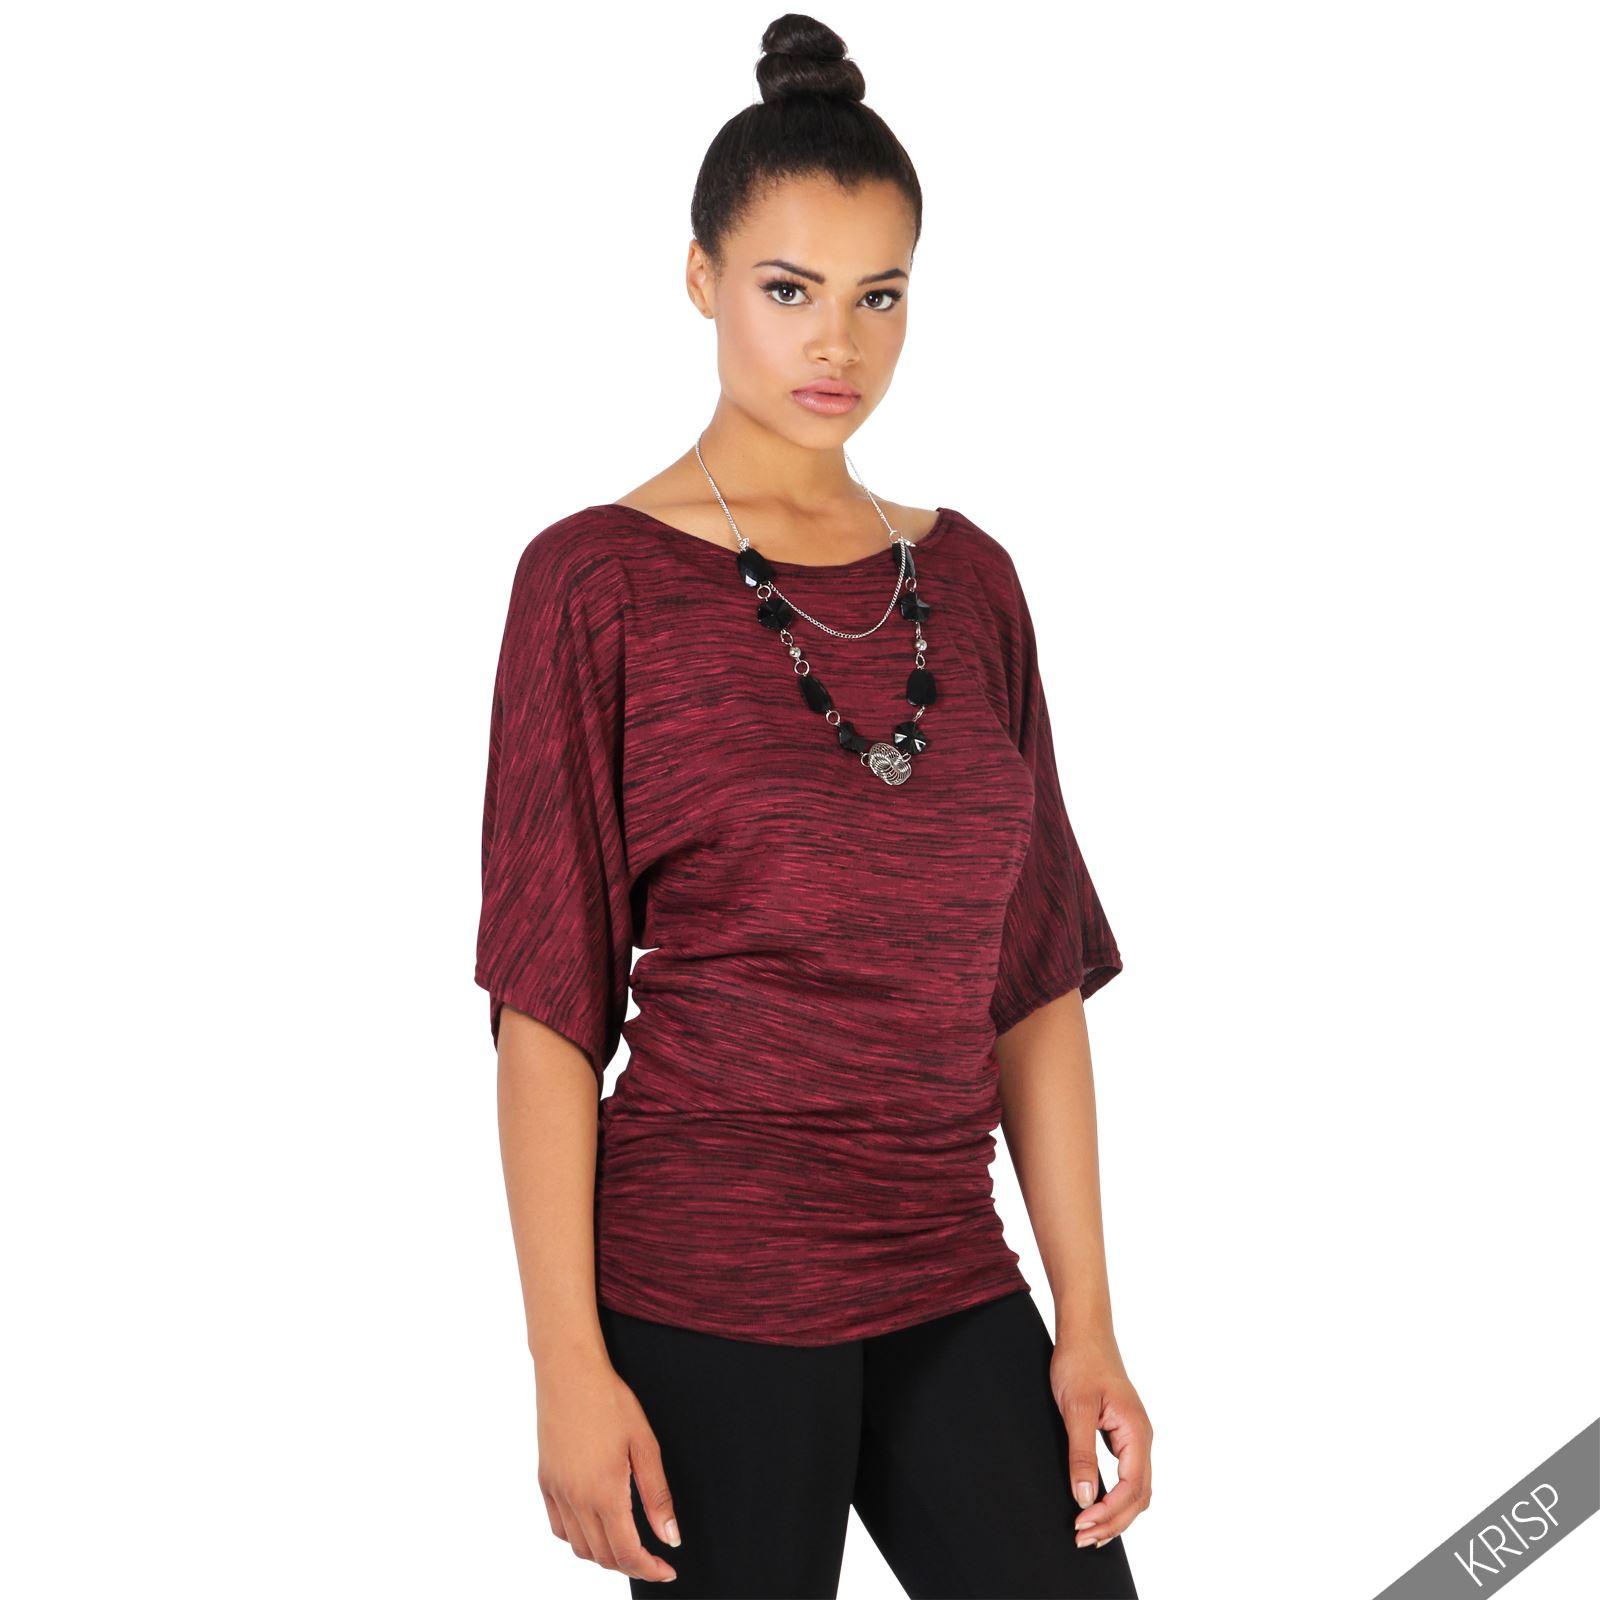 kleidung accessoires damenmode blusen tops shirts. Black Bedroom Furniture Sets. Home Design Ideas